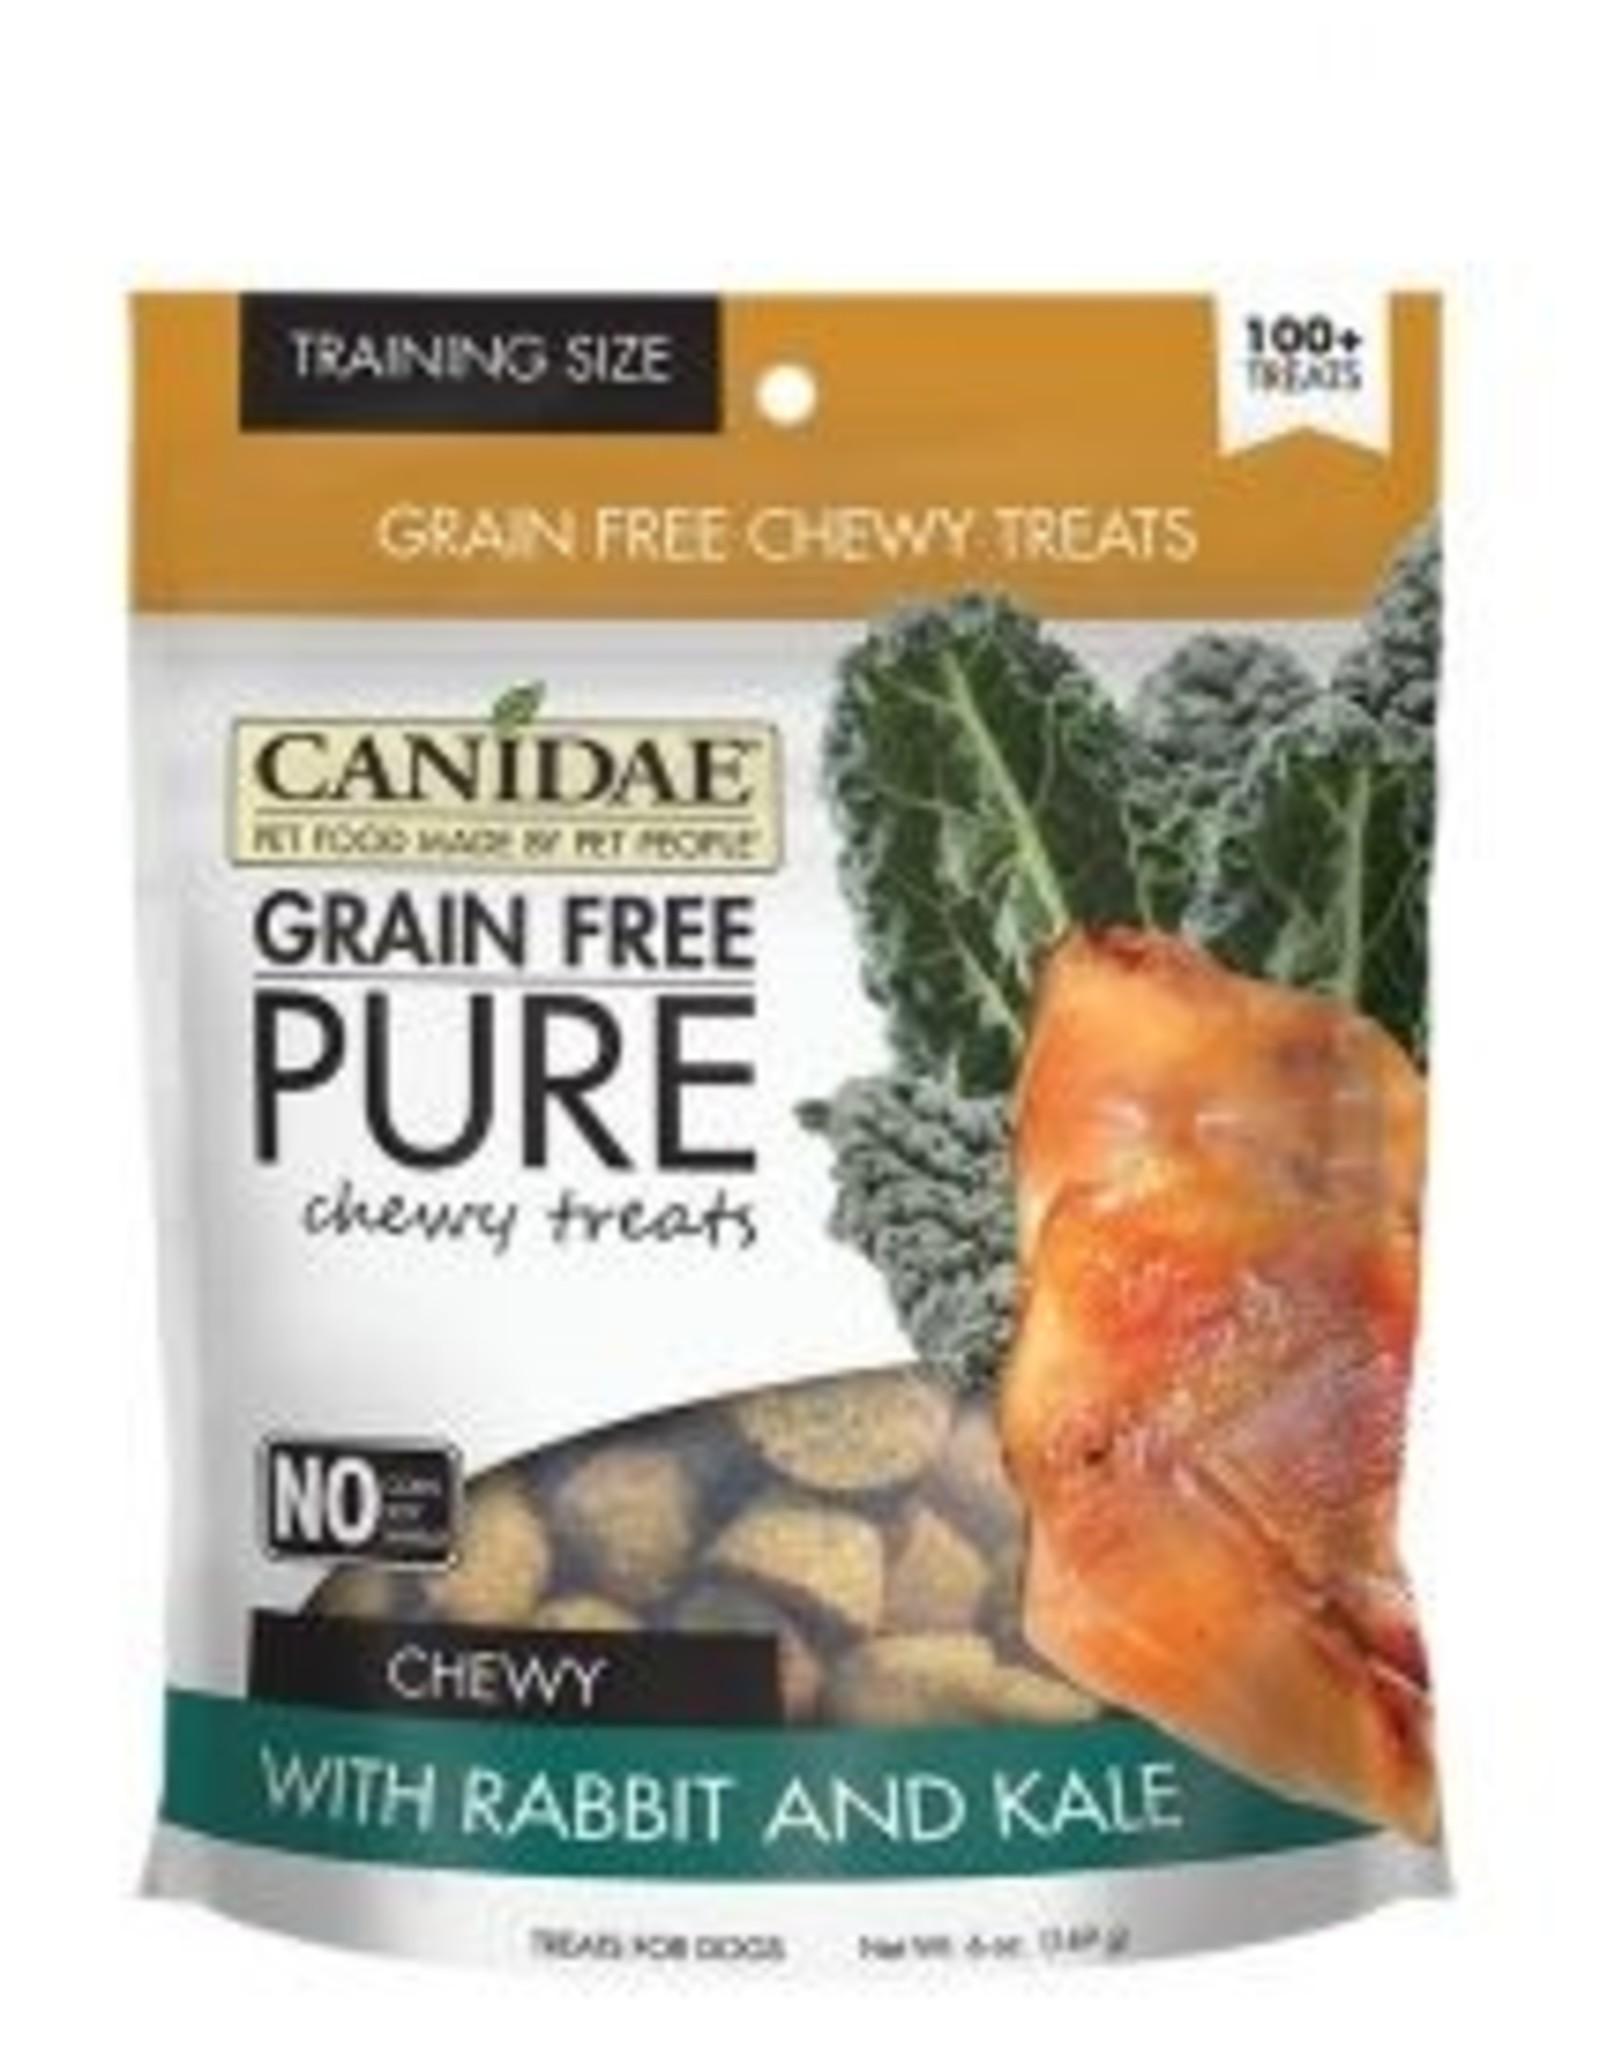 Canidae Grain-Free PURE Rabbit & Kale Chewy Dog Treats, 6 oz.